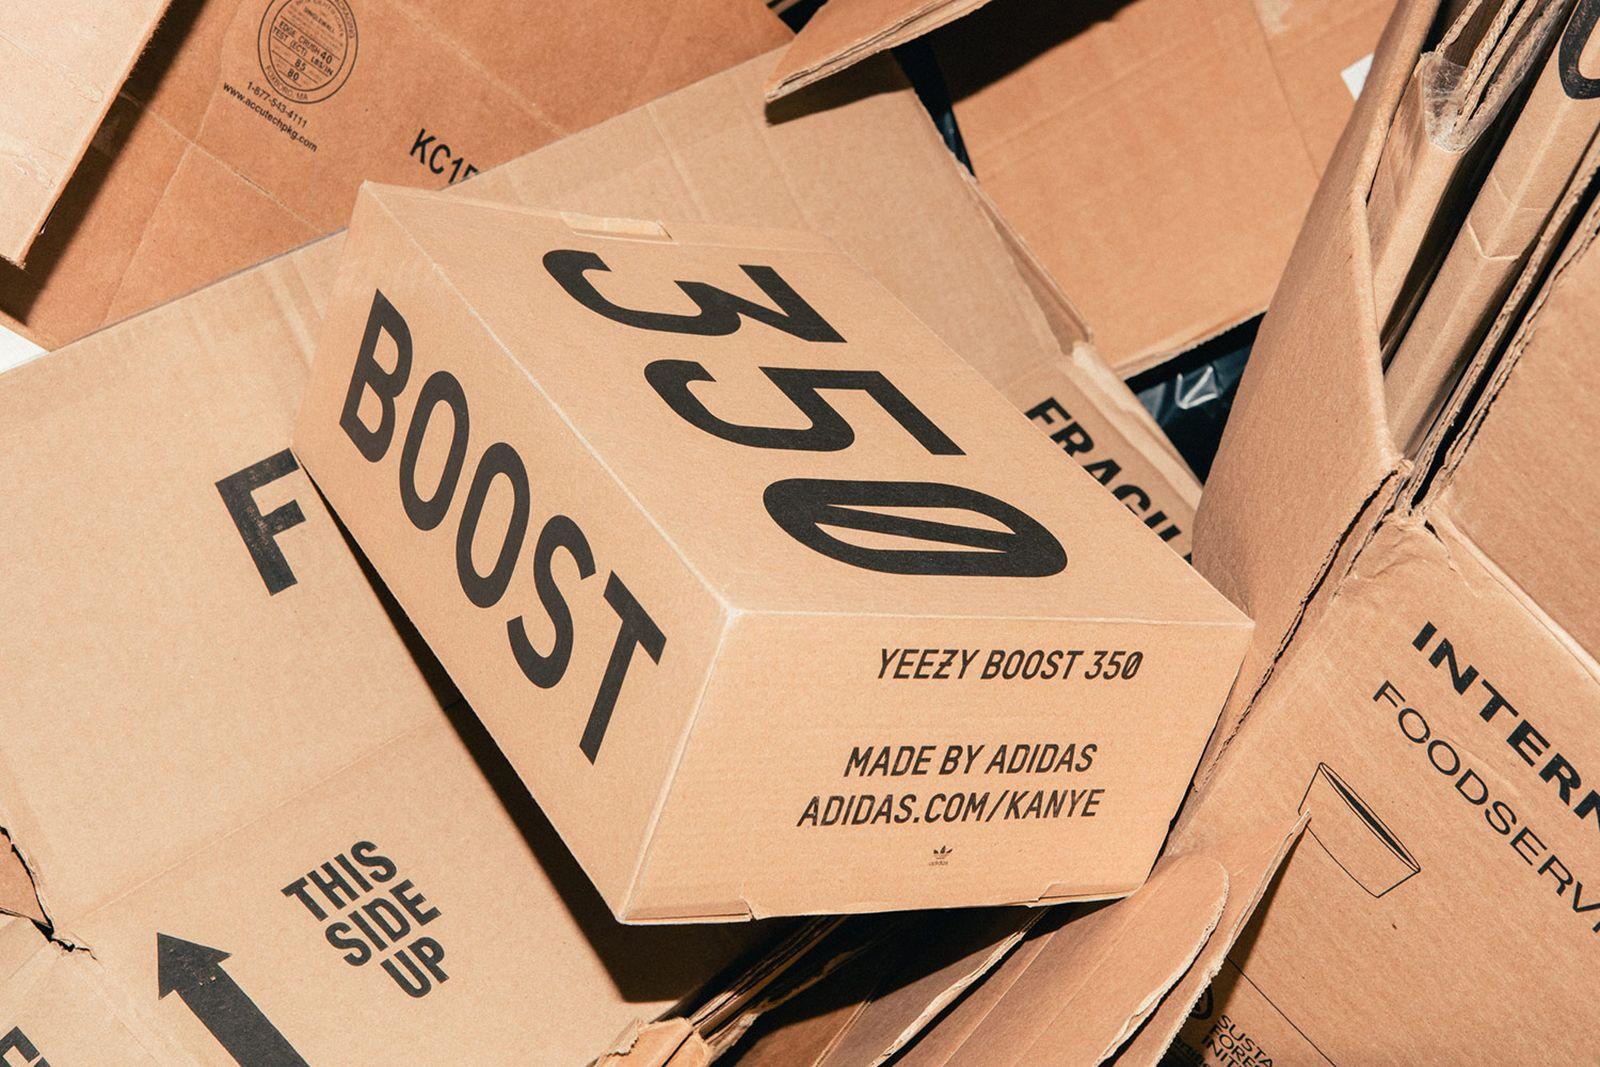 Legit-Check-Fake-Sneakers-Highsnobiety-01